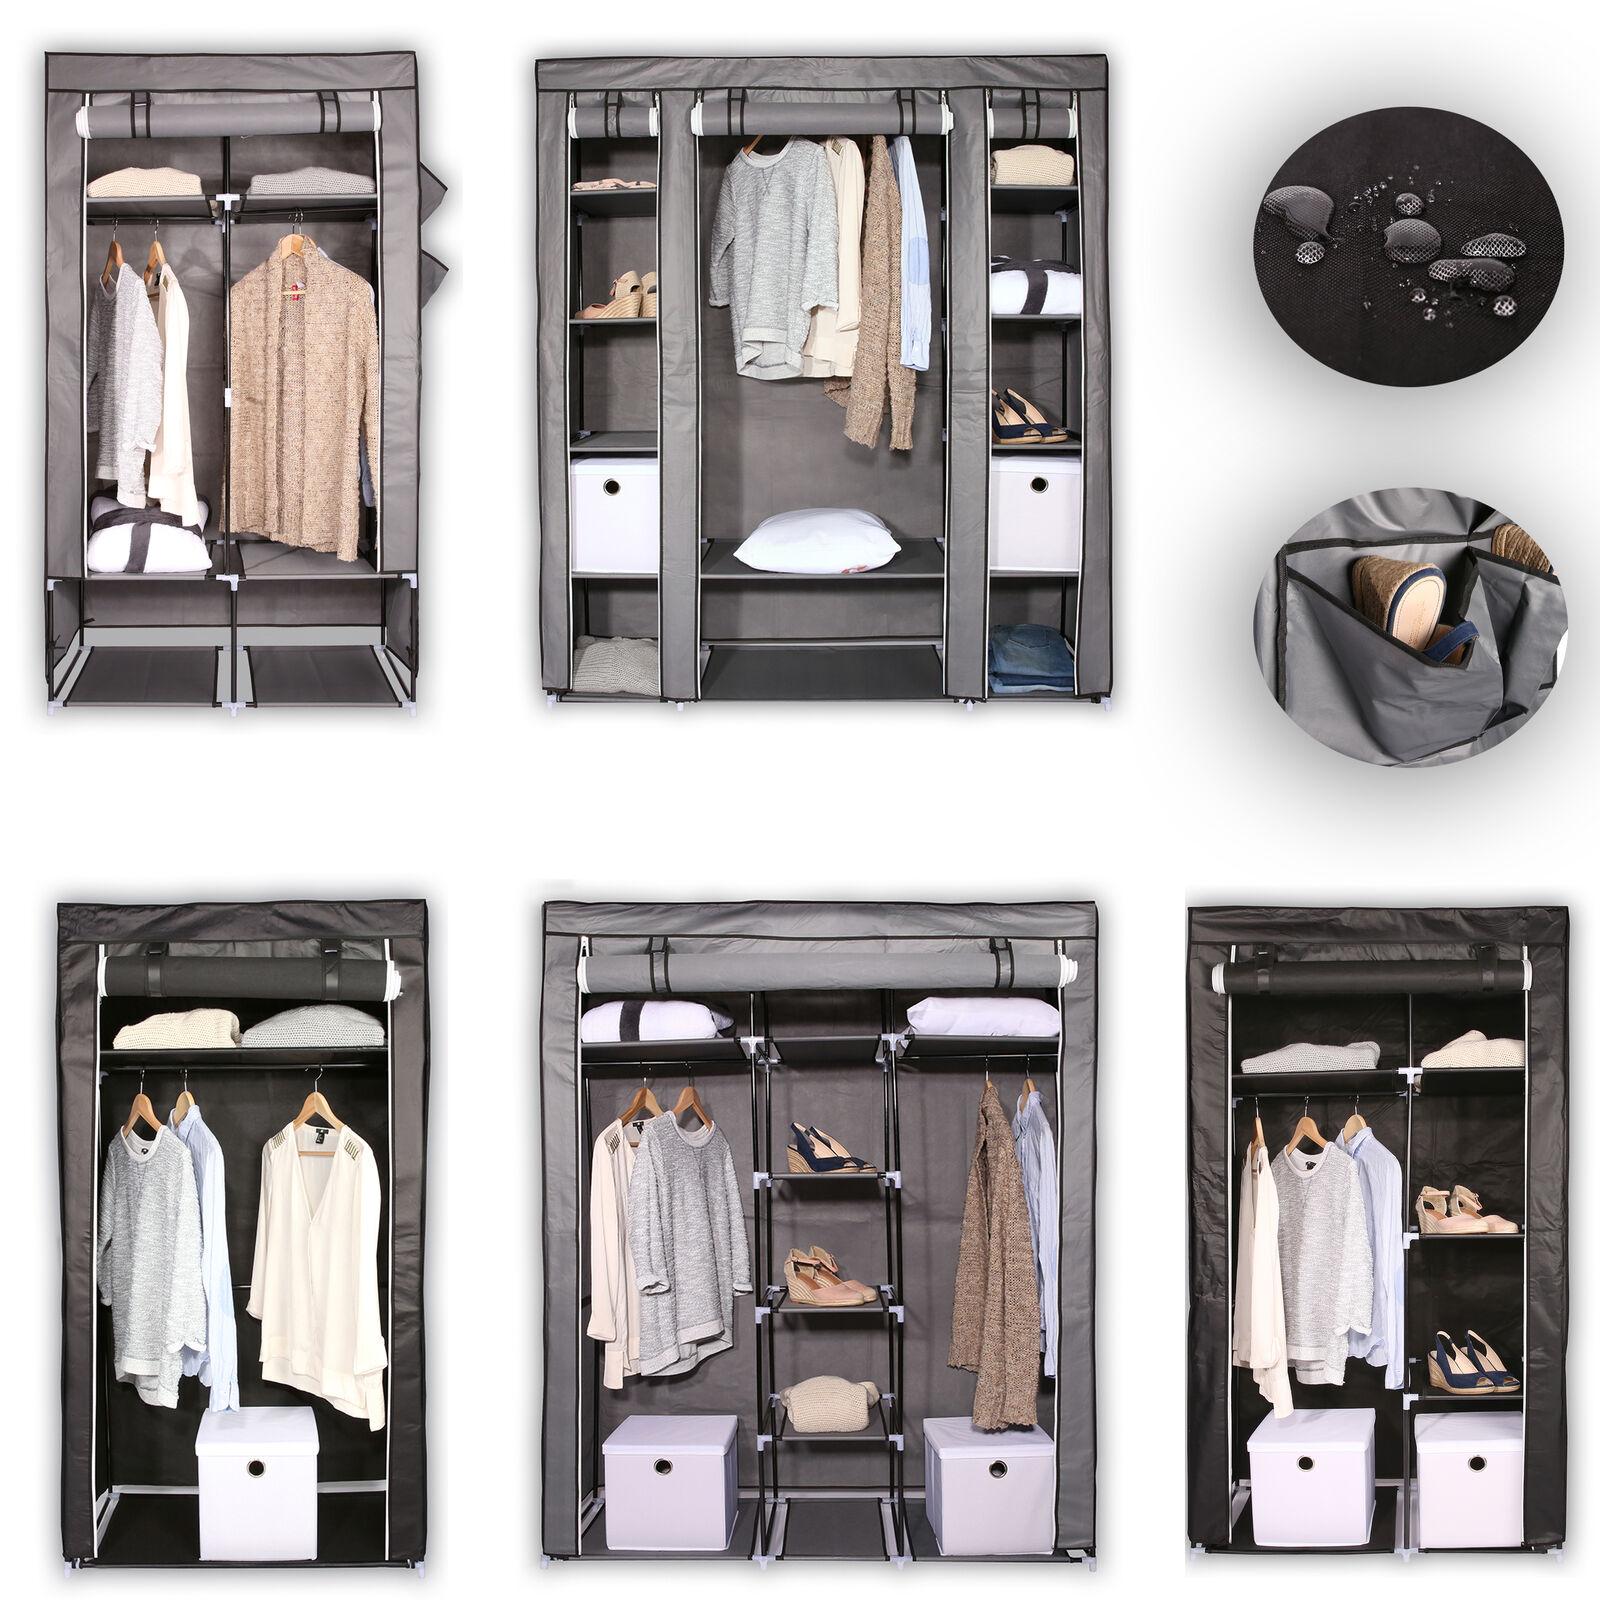 Faltschrank Kleiderschrank Garderobenschrank Campingschrank Stoffschrank Textil